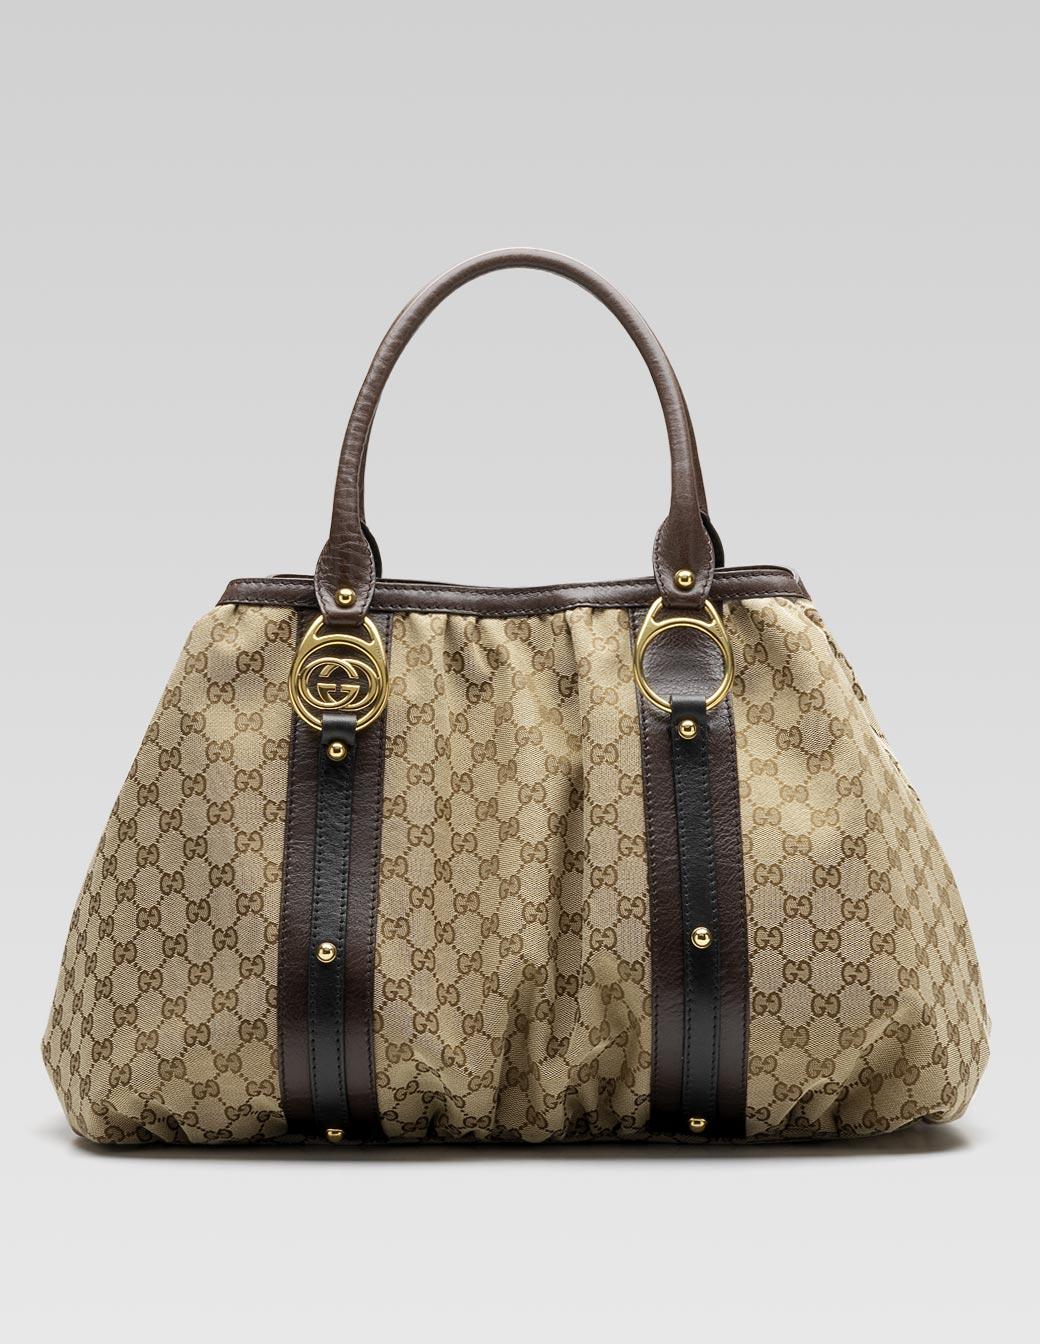 Unique   Shoes Amp Accessories Gt Women39s Handbags Amp Bags Gt Handb